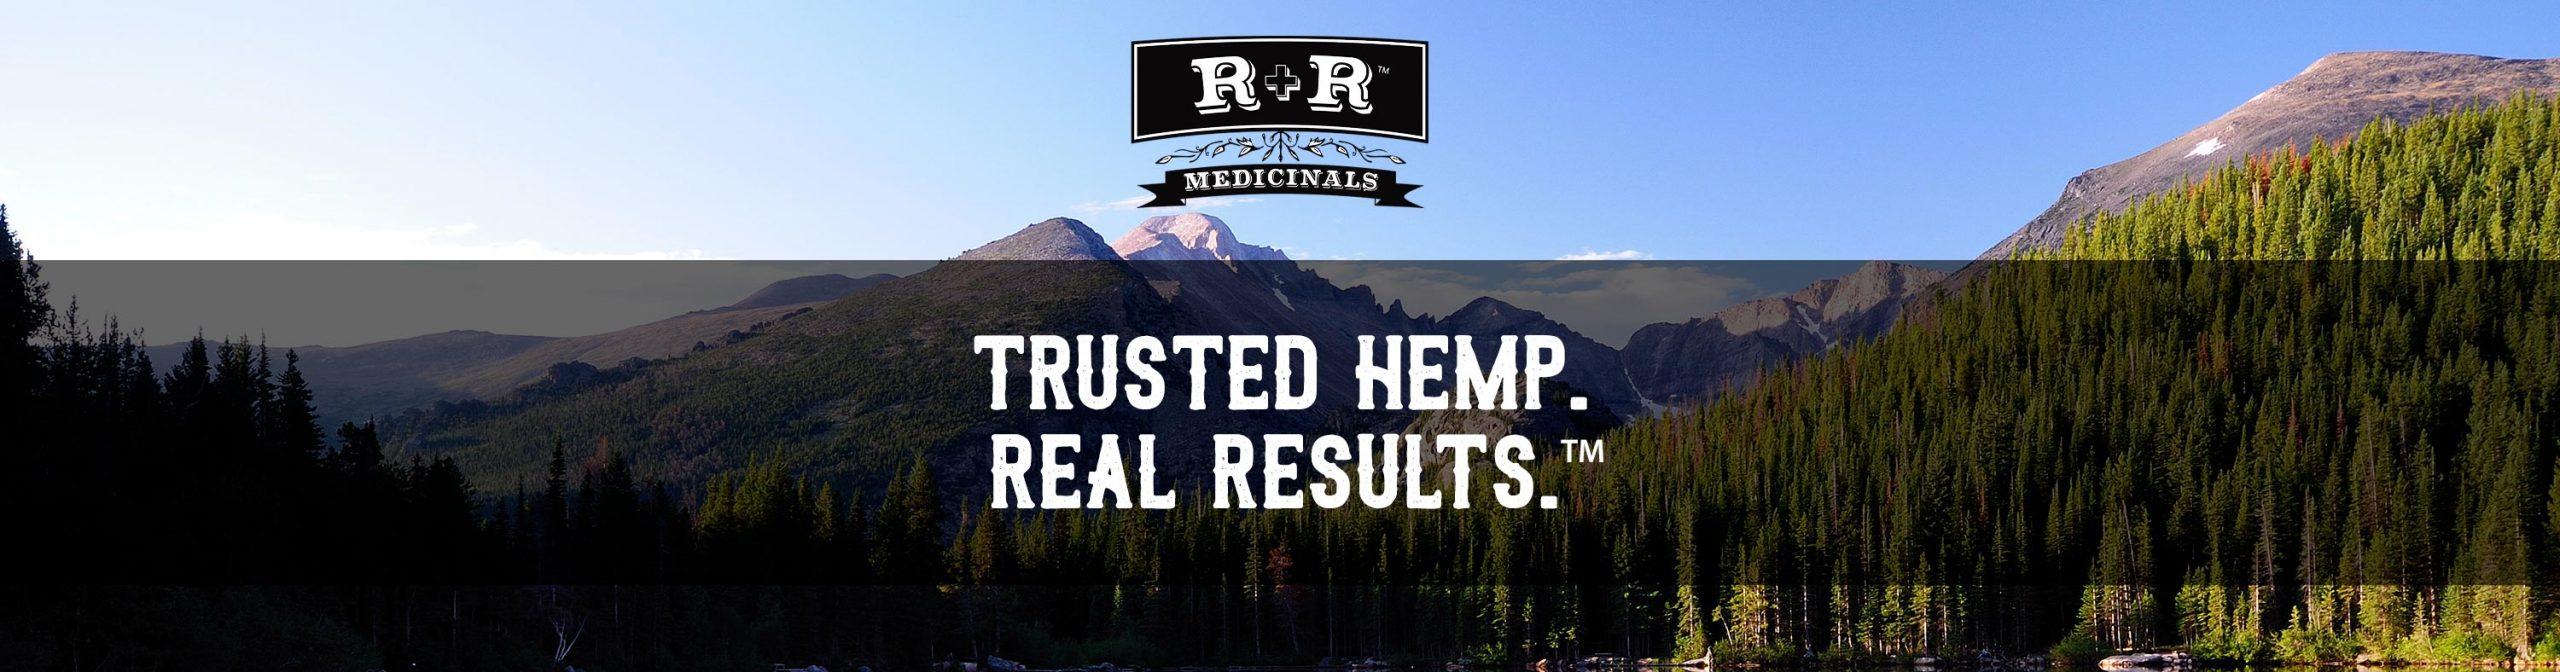 R+R medicinals coupons review 2021